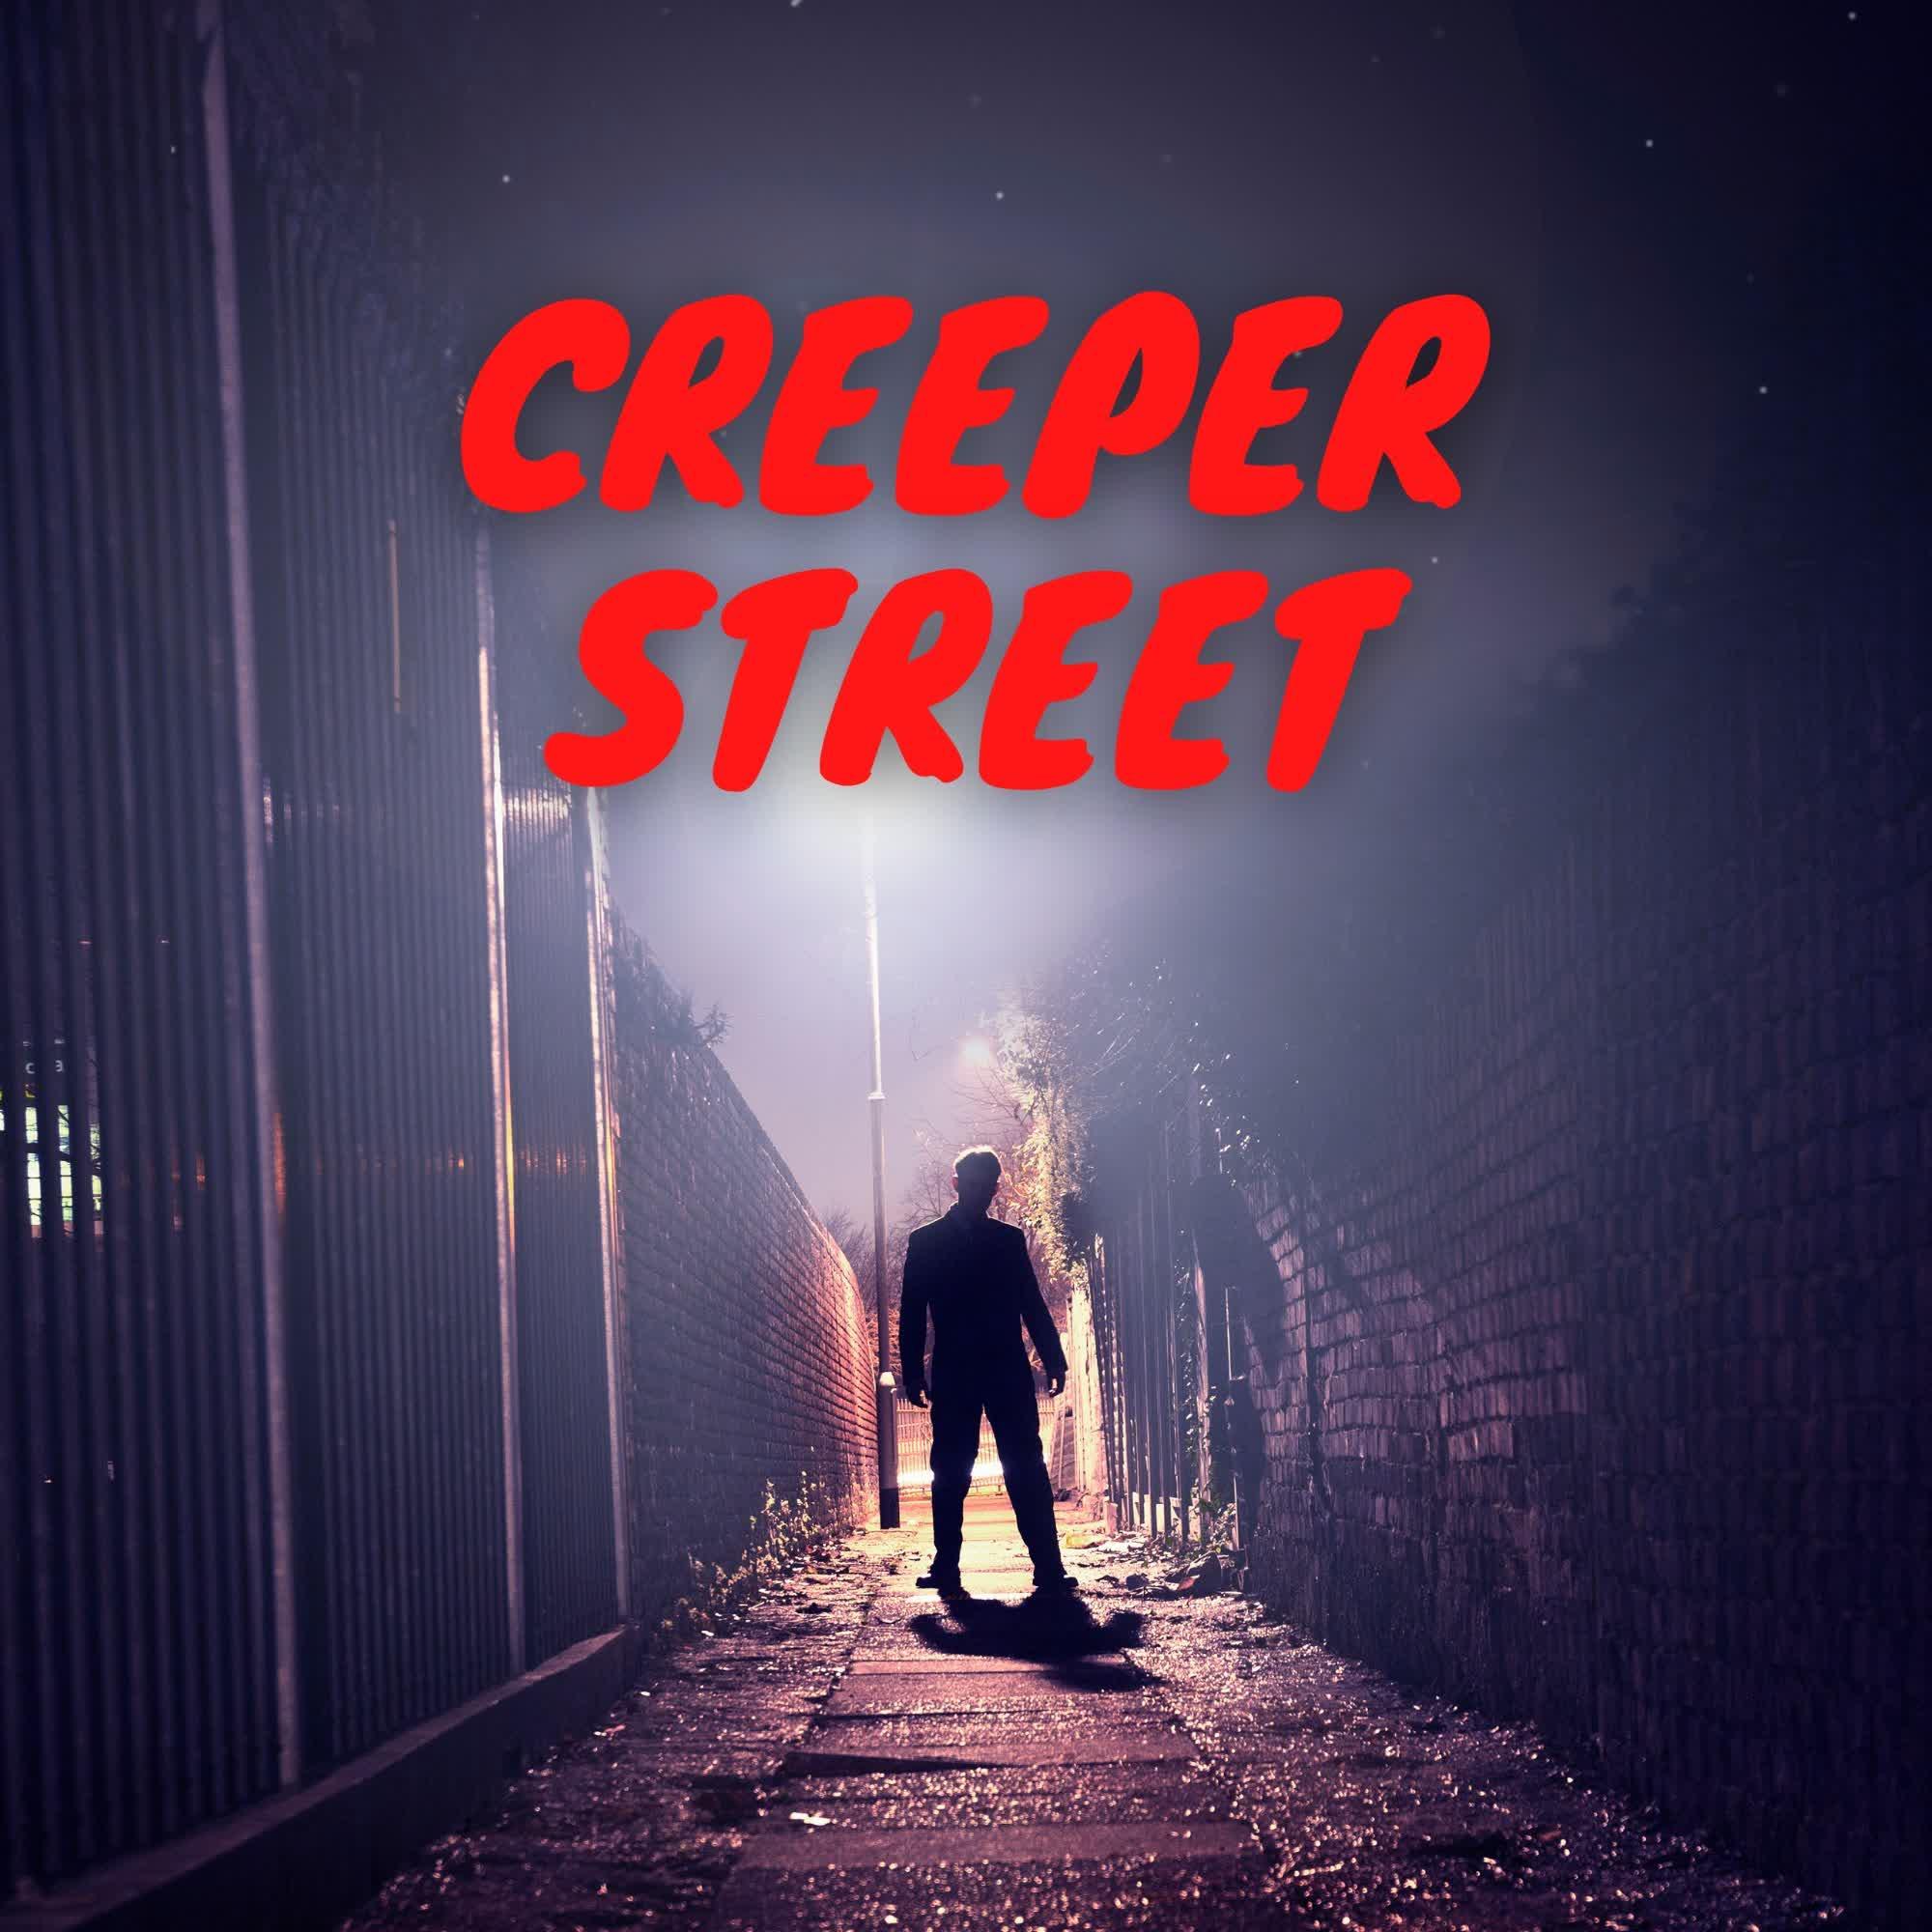 Halloween Special 2020 - Creeper Street